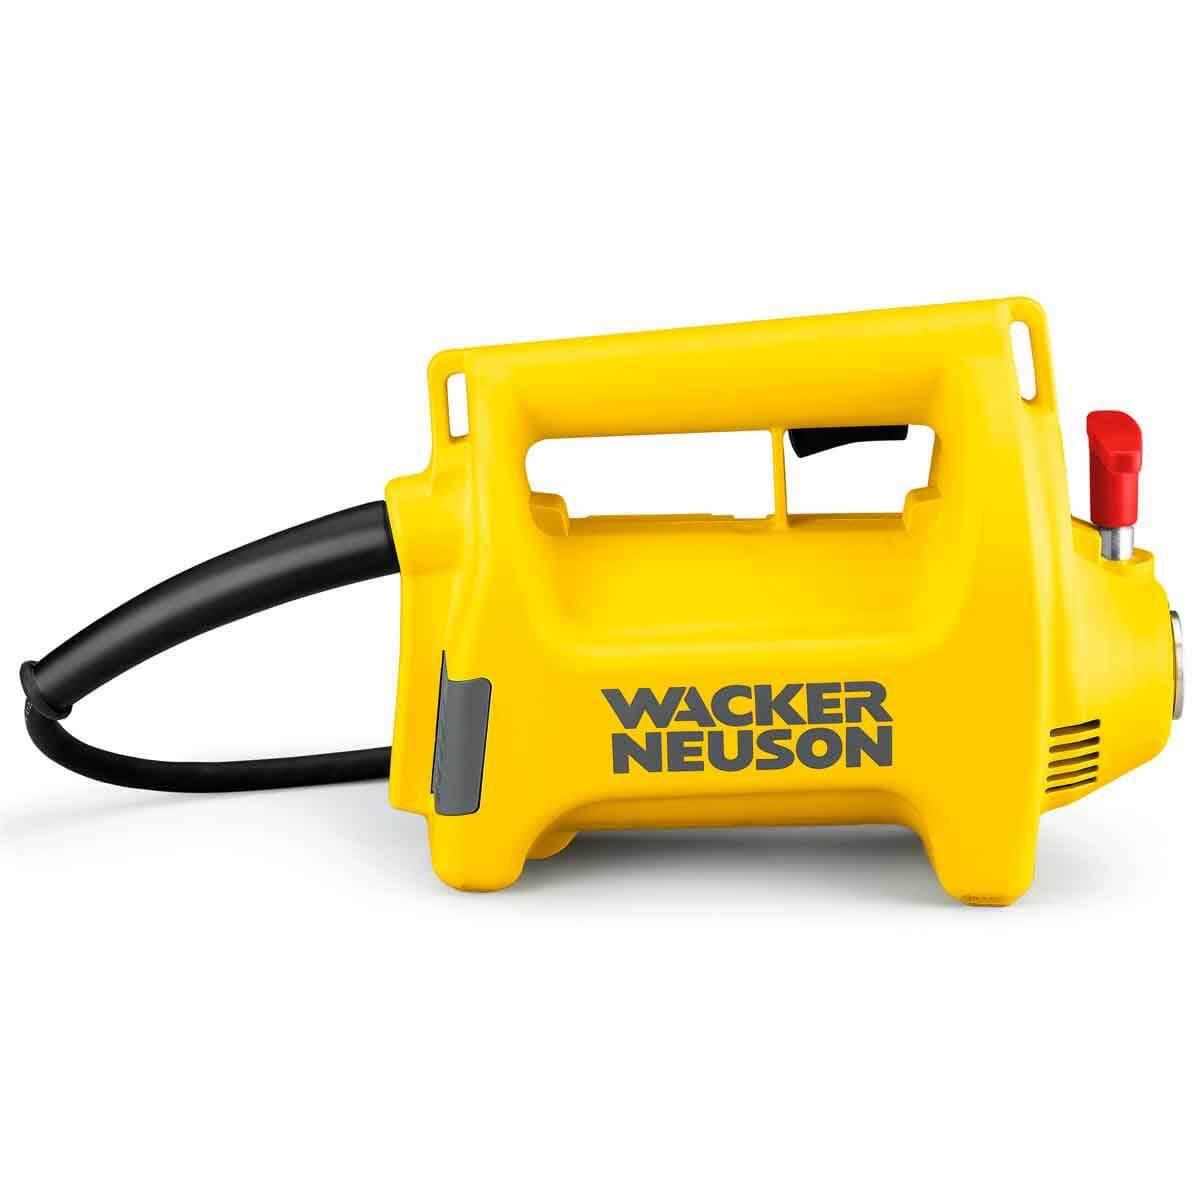 Wacker Neuson Vibrator M2500 action